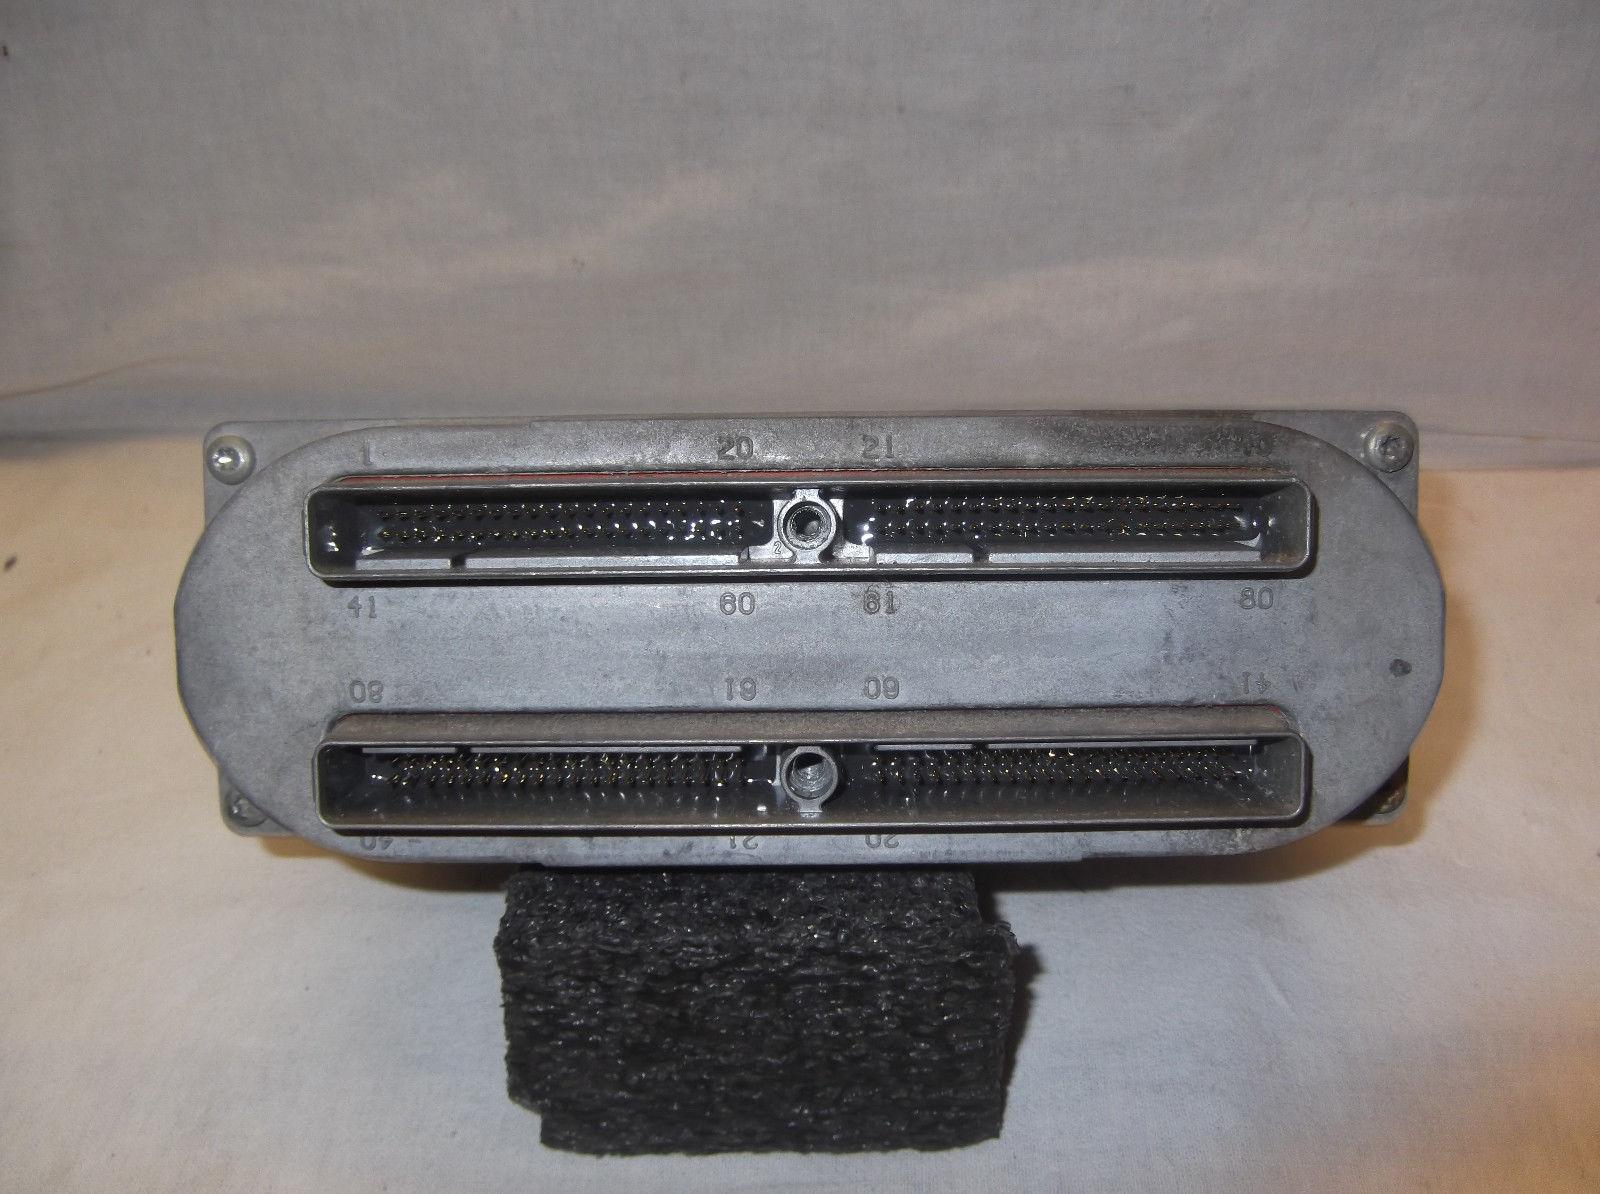 Cadillac Pcm Acdelco Radio Wiring Diagram 96 Caddy 97 98 99 Deville Seville Engine Control